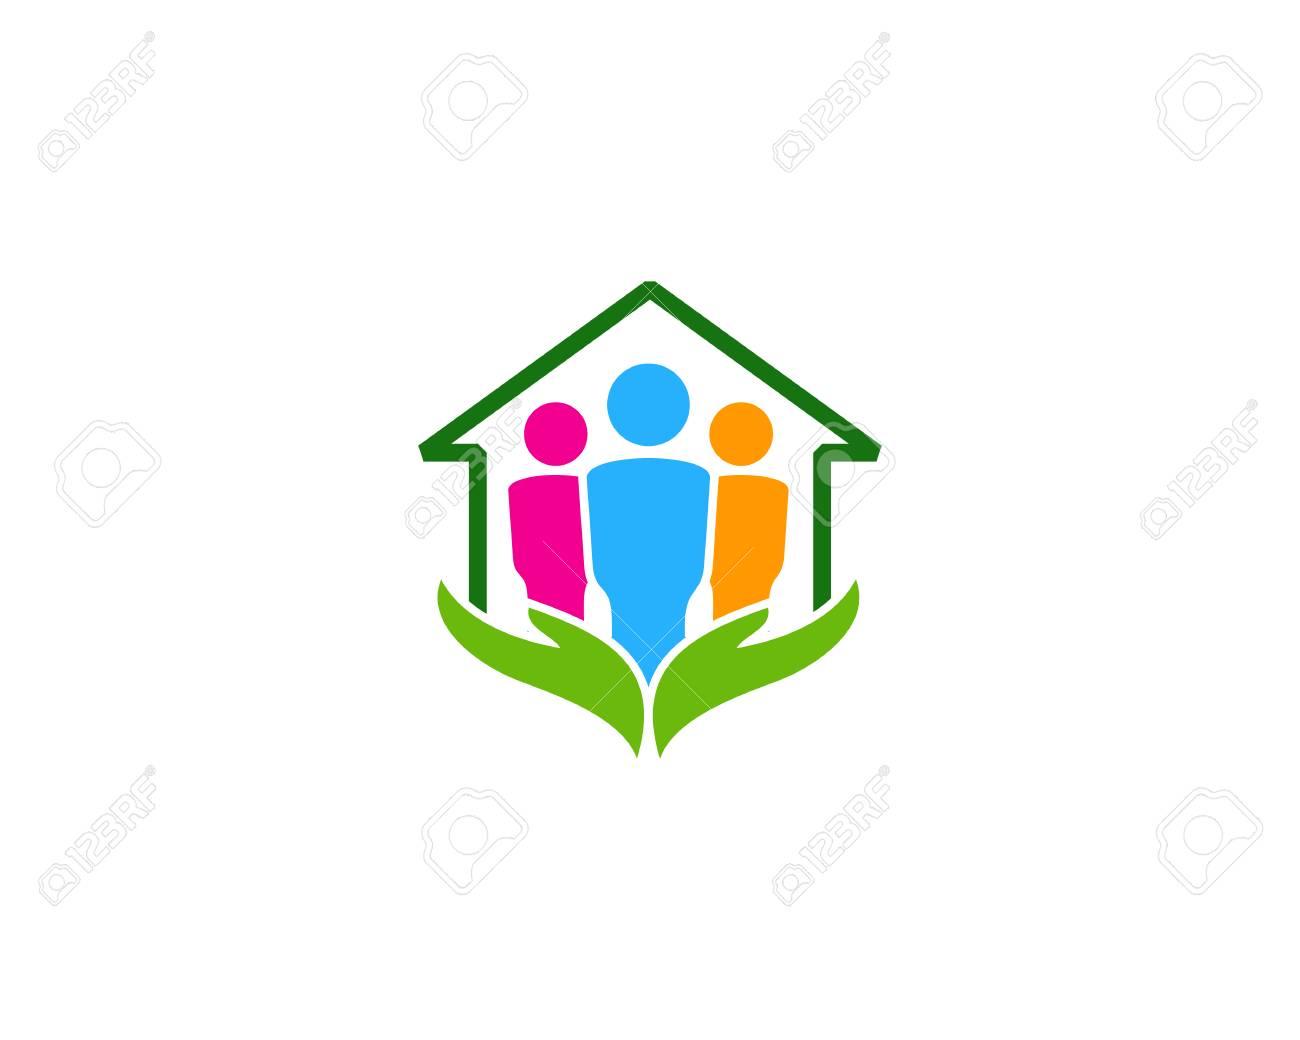 Care Team Home Logo Icon Design - 100600665